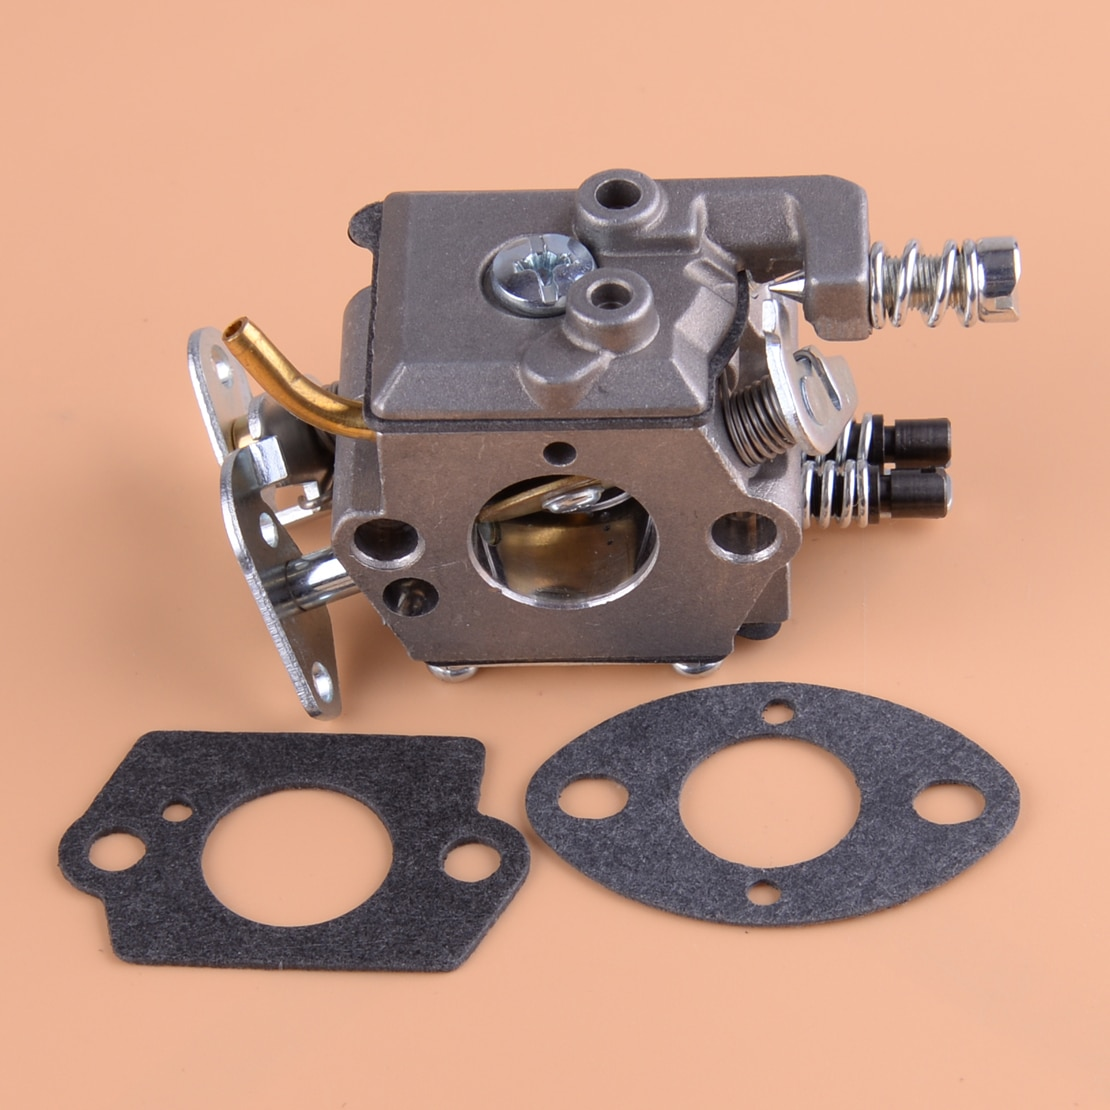 Kit de carburateur LETAOSK 530071987 530019172 530035482 pour Husqvarna 36 41 136 137 137e 141 142 tronçonneuse Zama C1Q-W29E